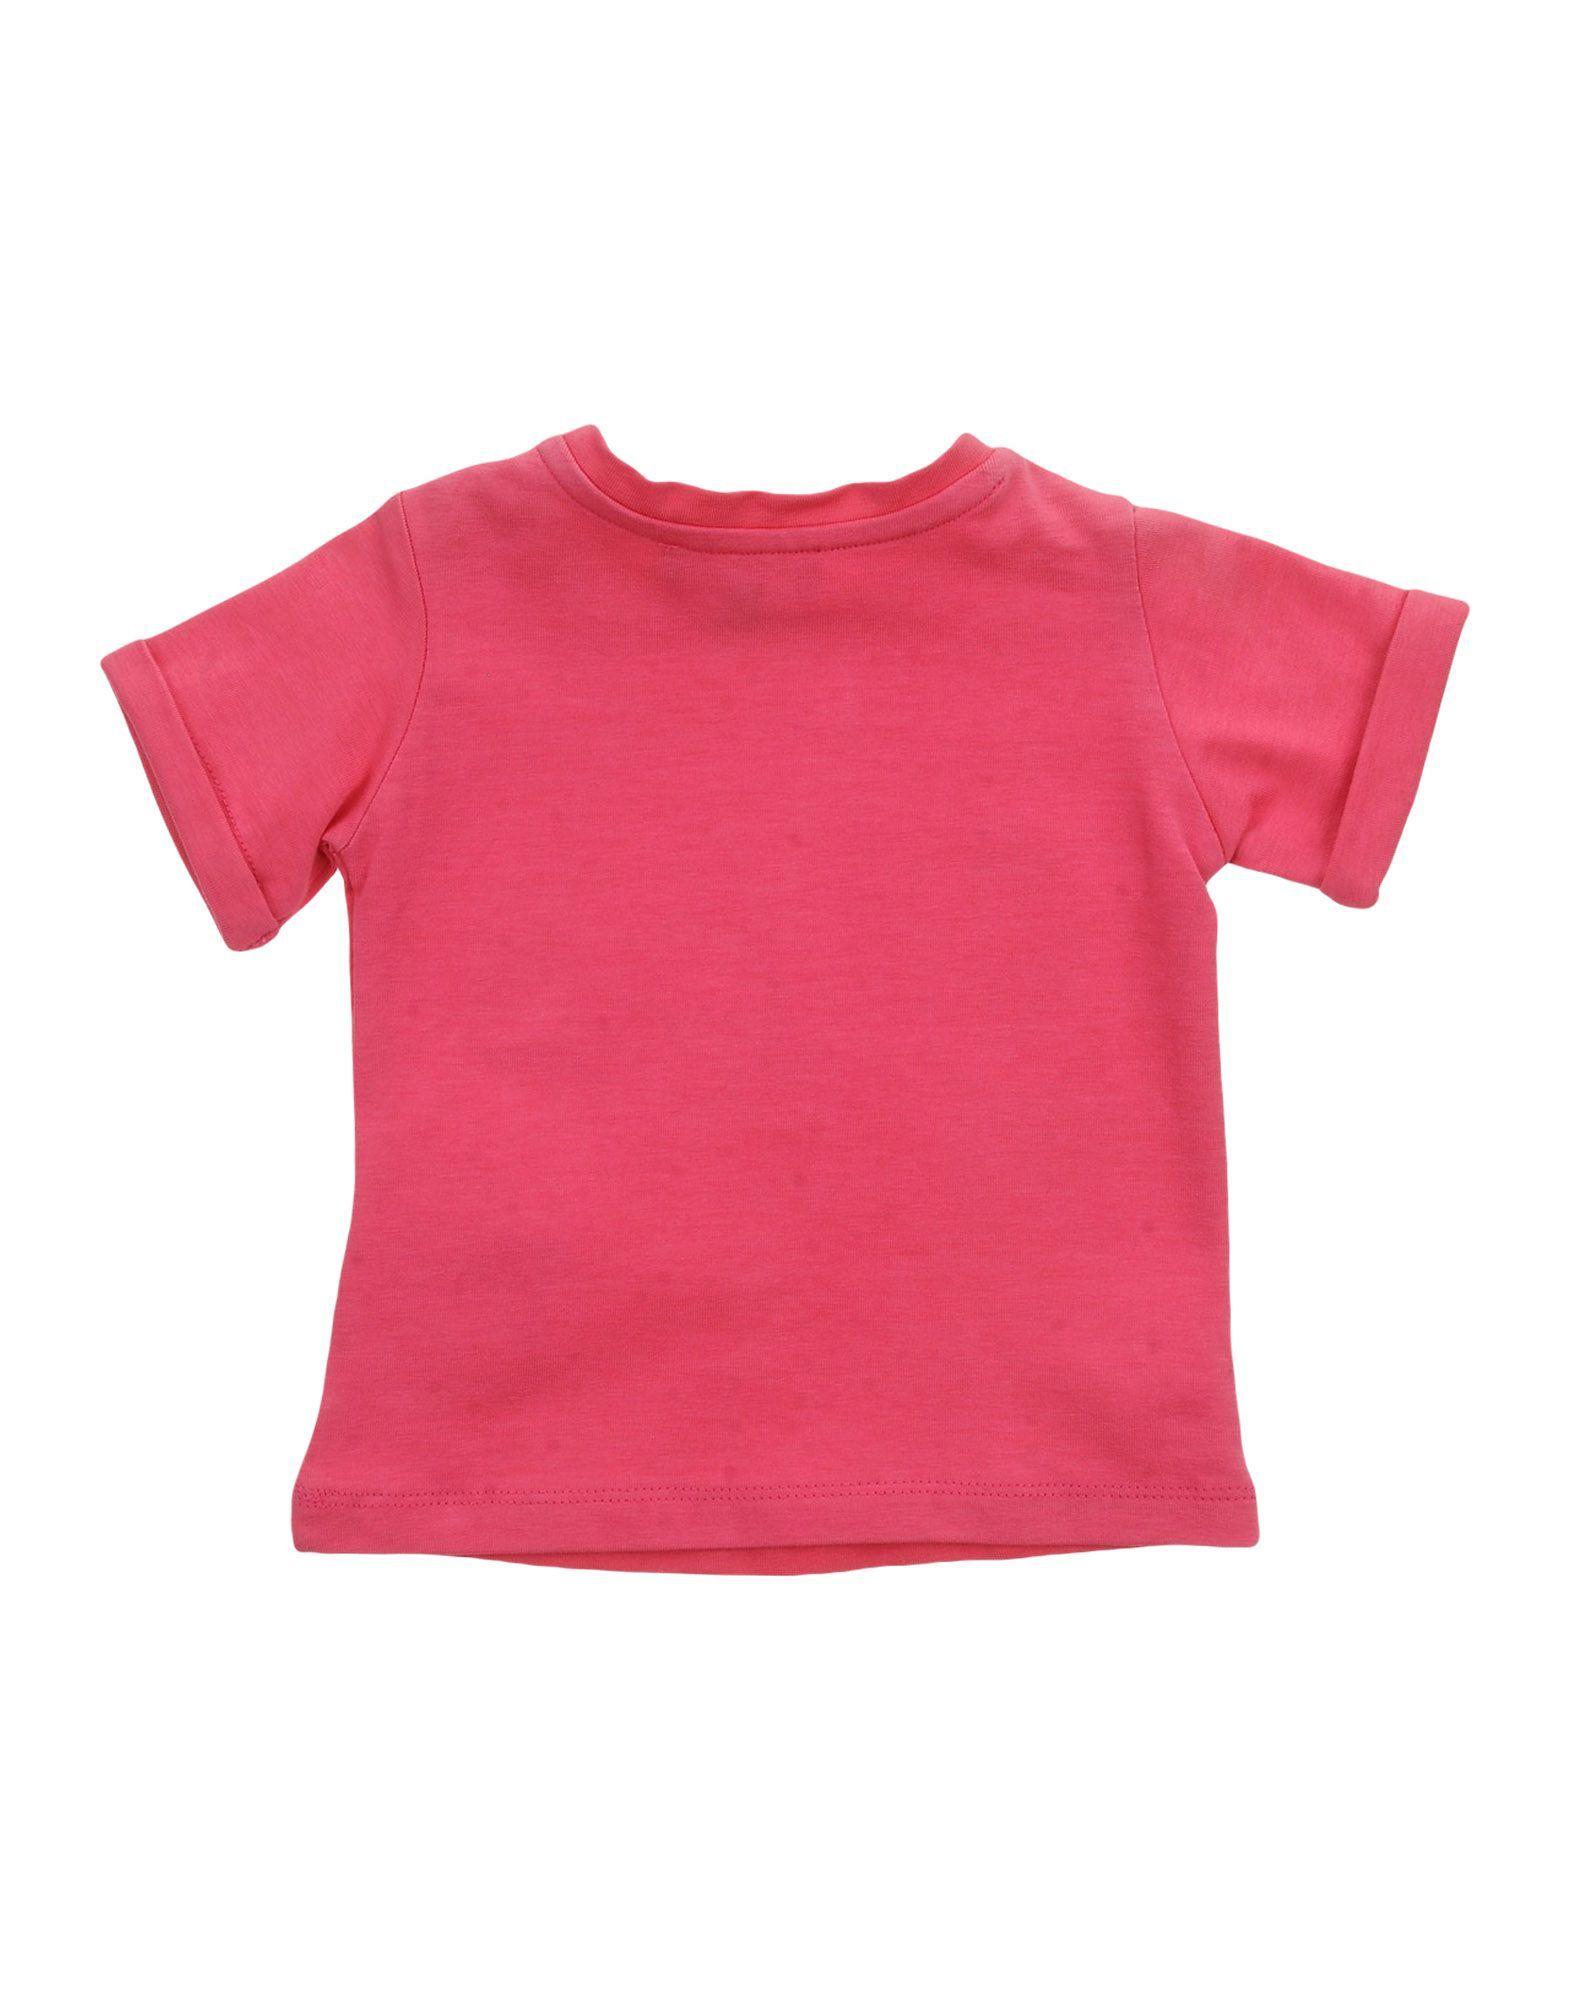 Roberto Cavalli Junior Fuchsia Cotton T-shirt